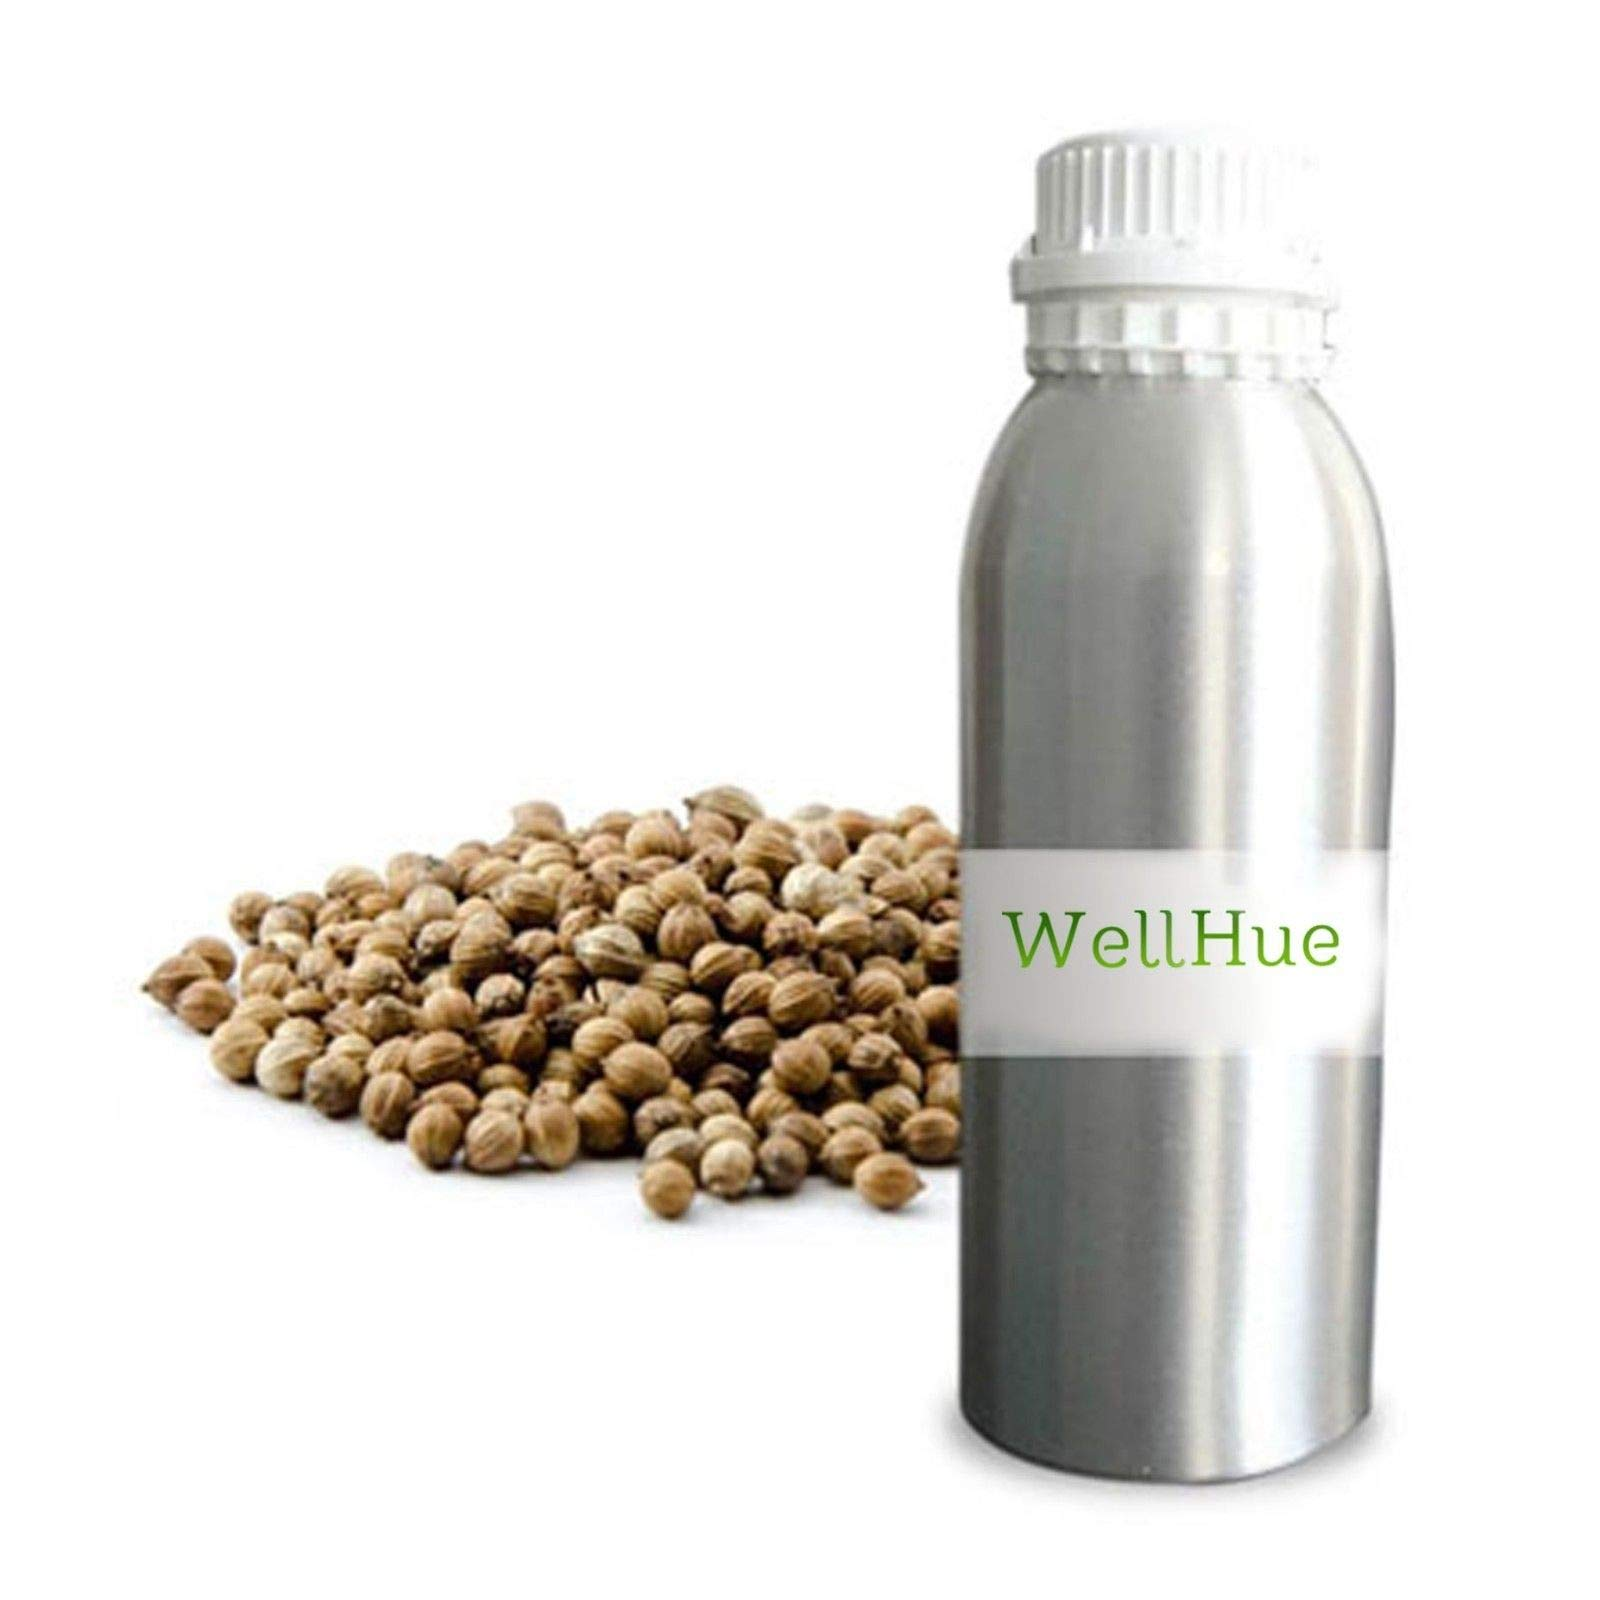 WellHue Coriander (Roasted) Oleoresins 5ML to 250ML